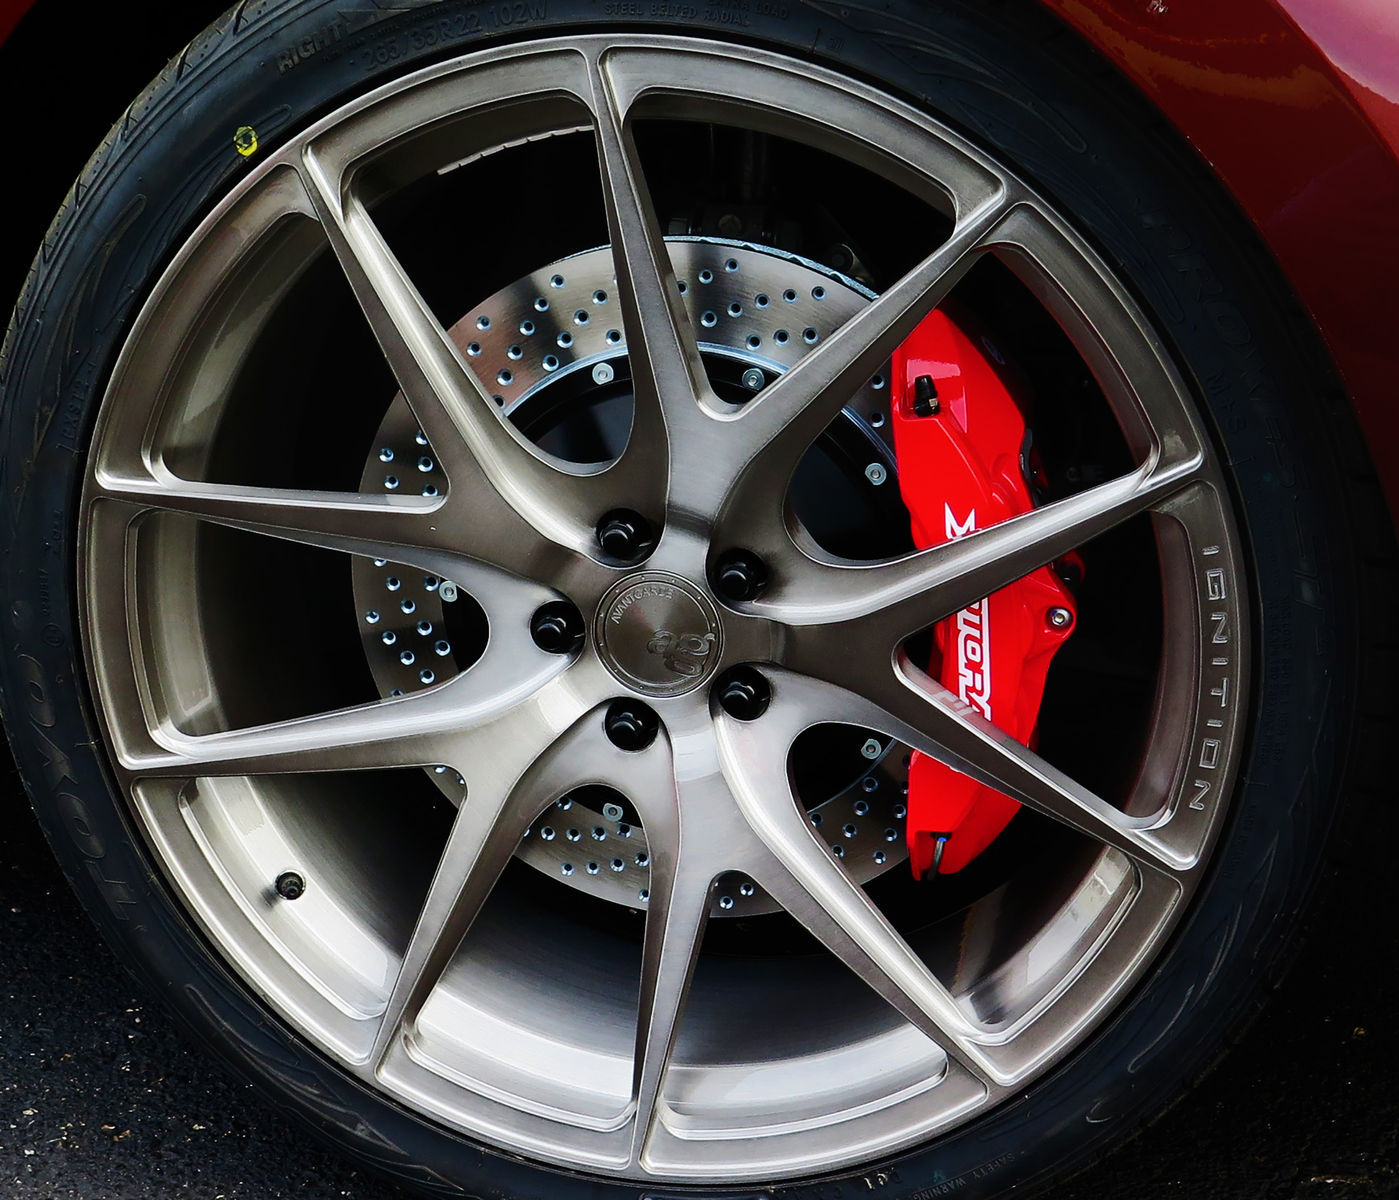 Ford Edge  Webasto Ford Edge Brakes Calipers Avant Garde Wheels